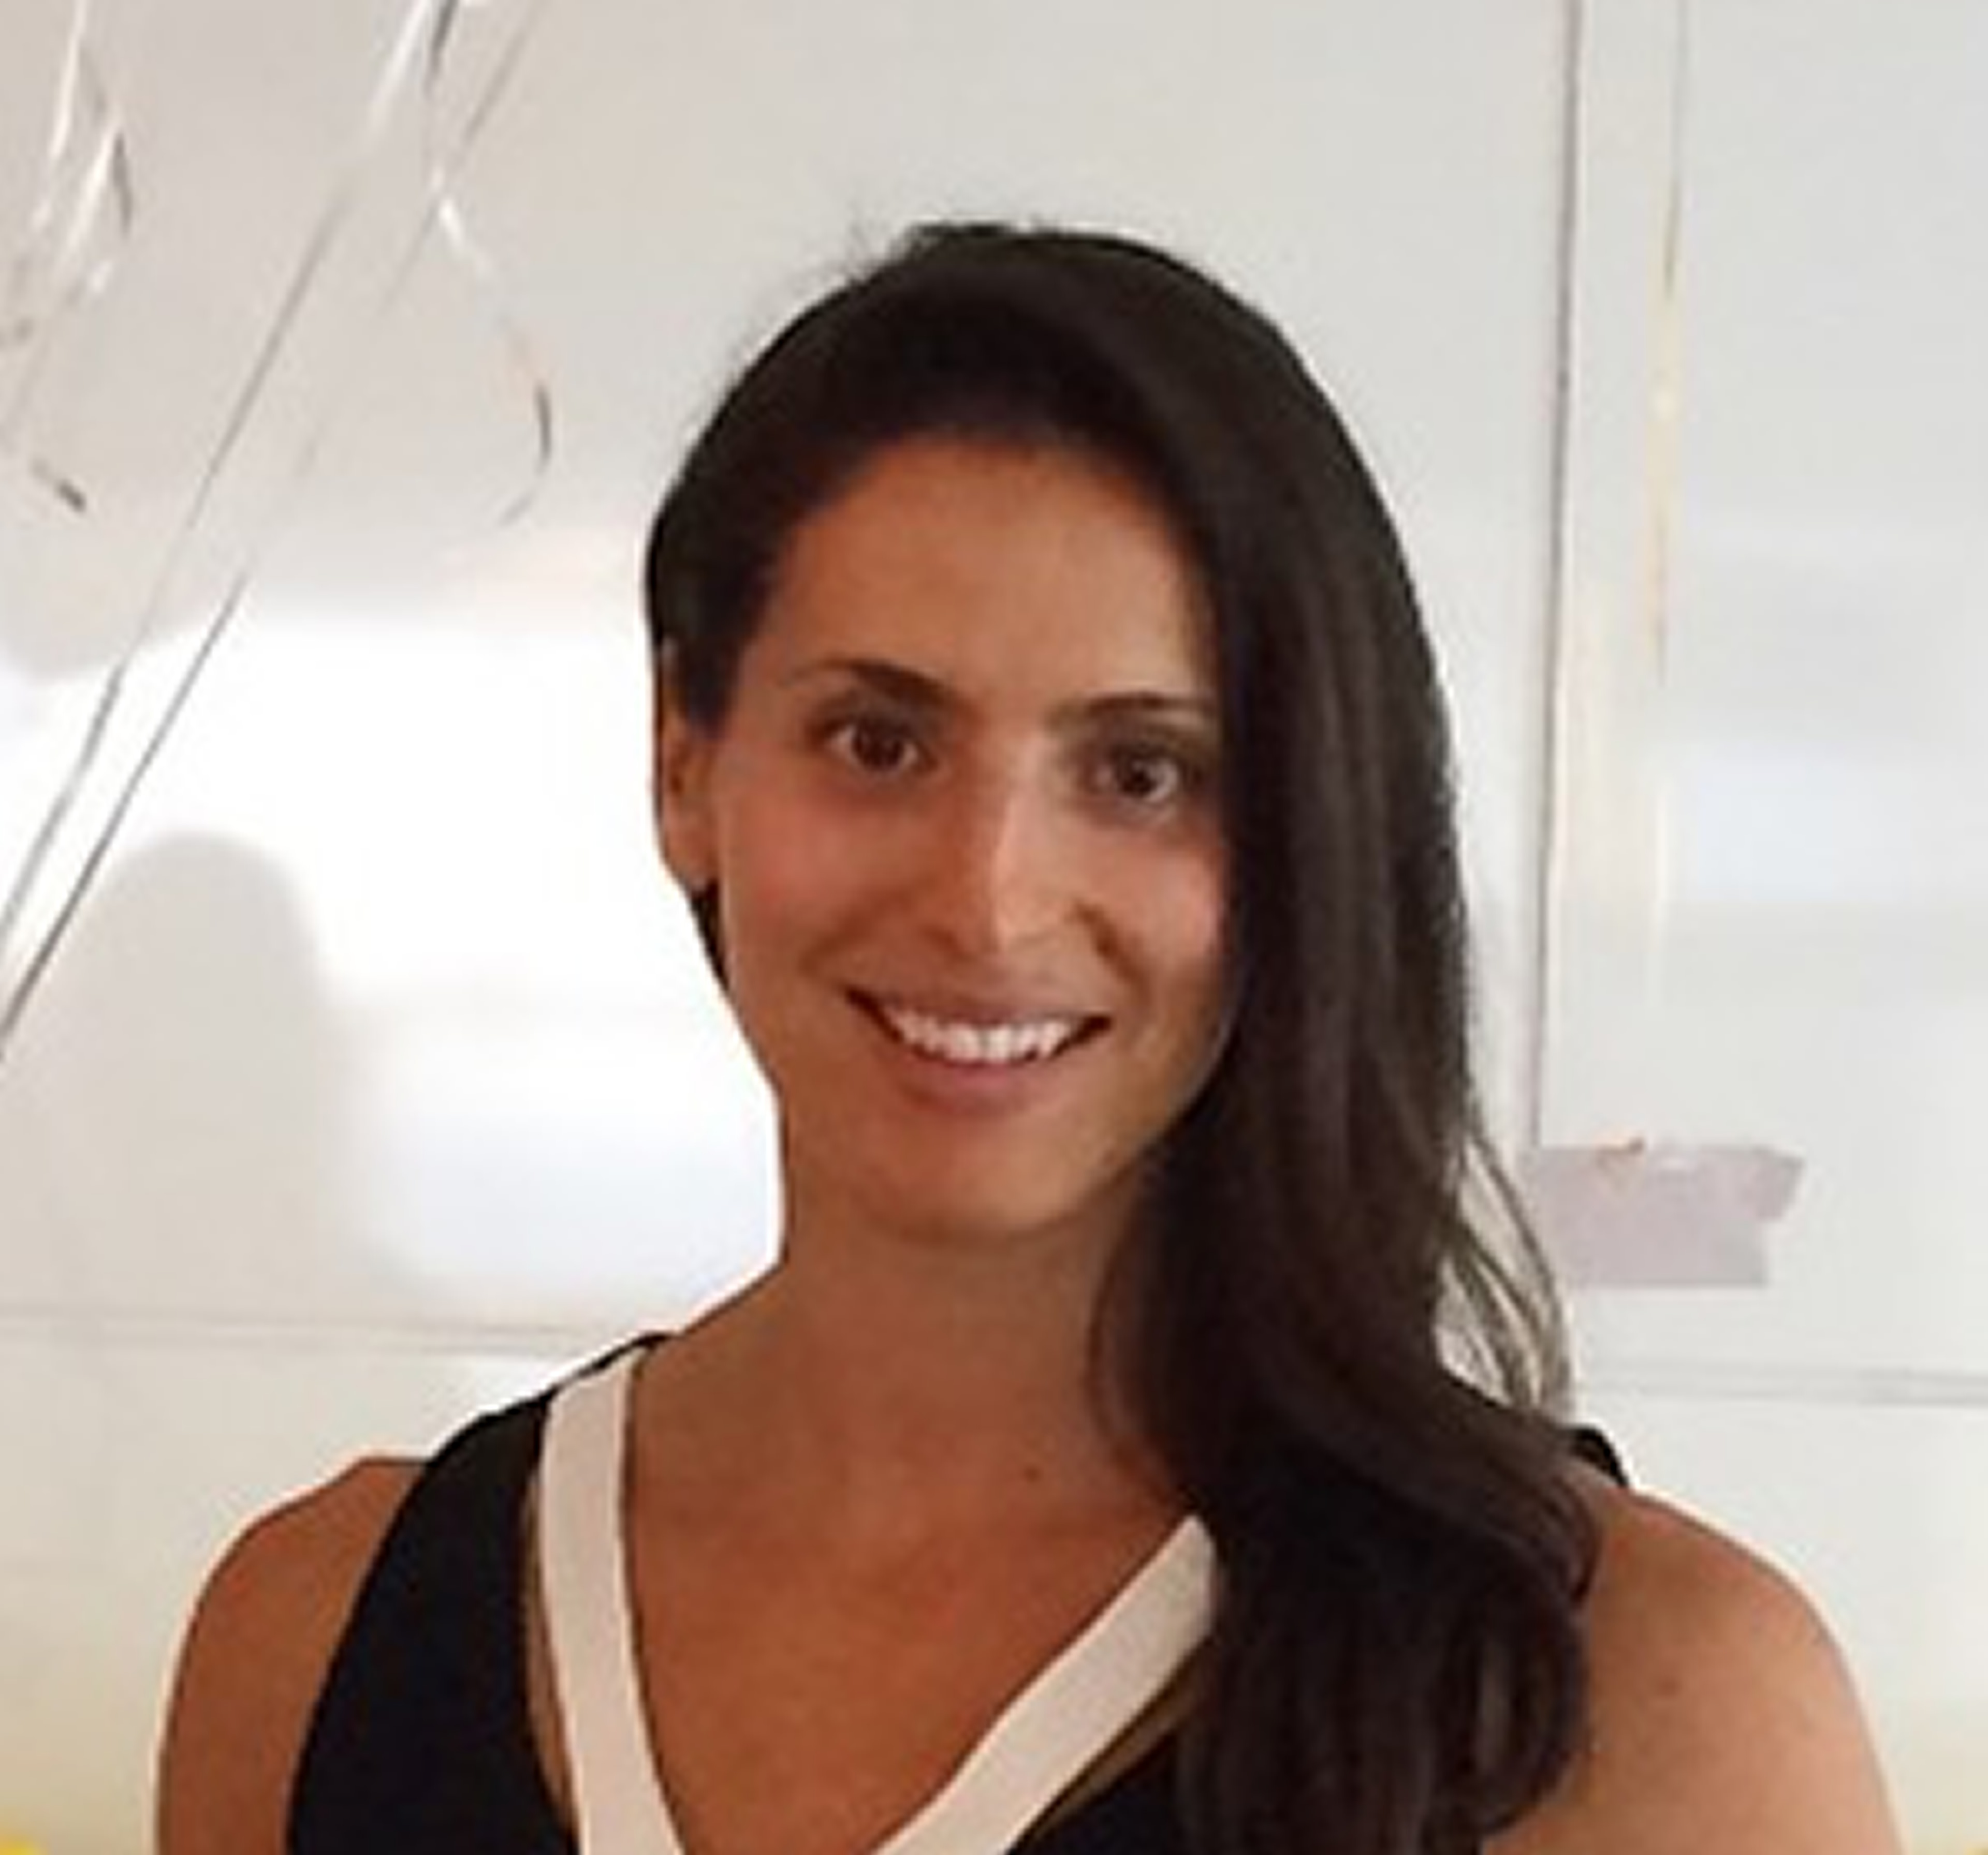 Sabrina Swinden